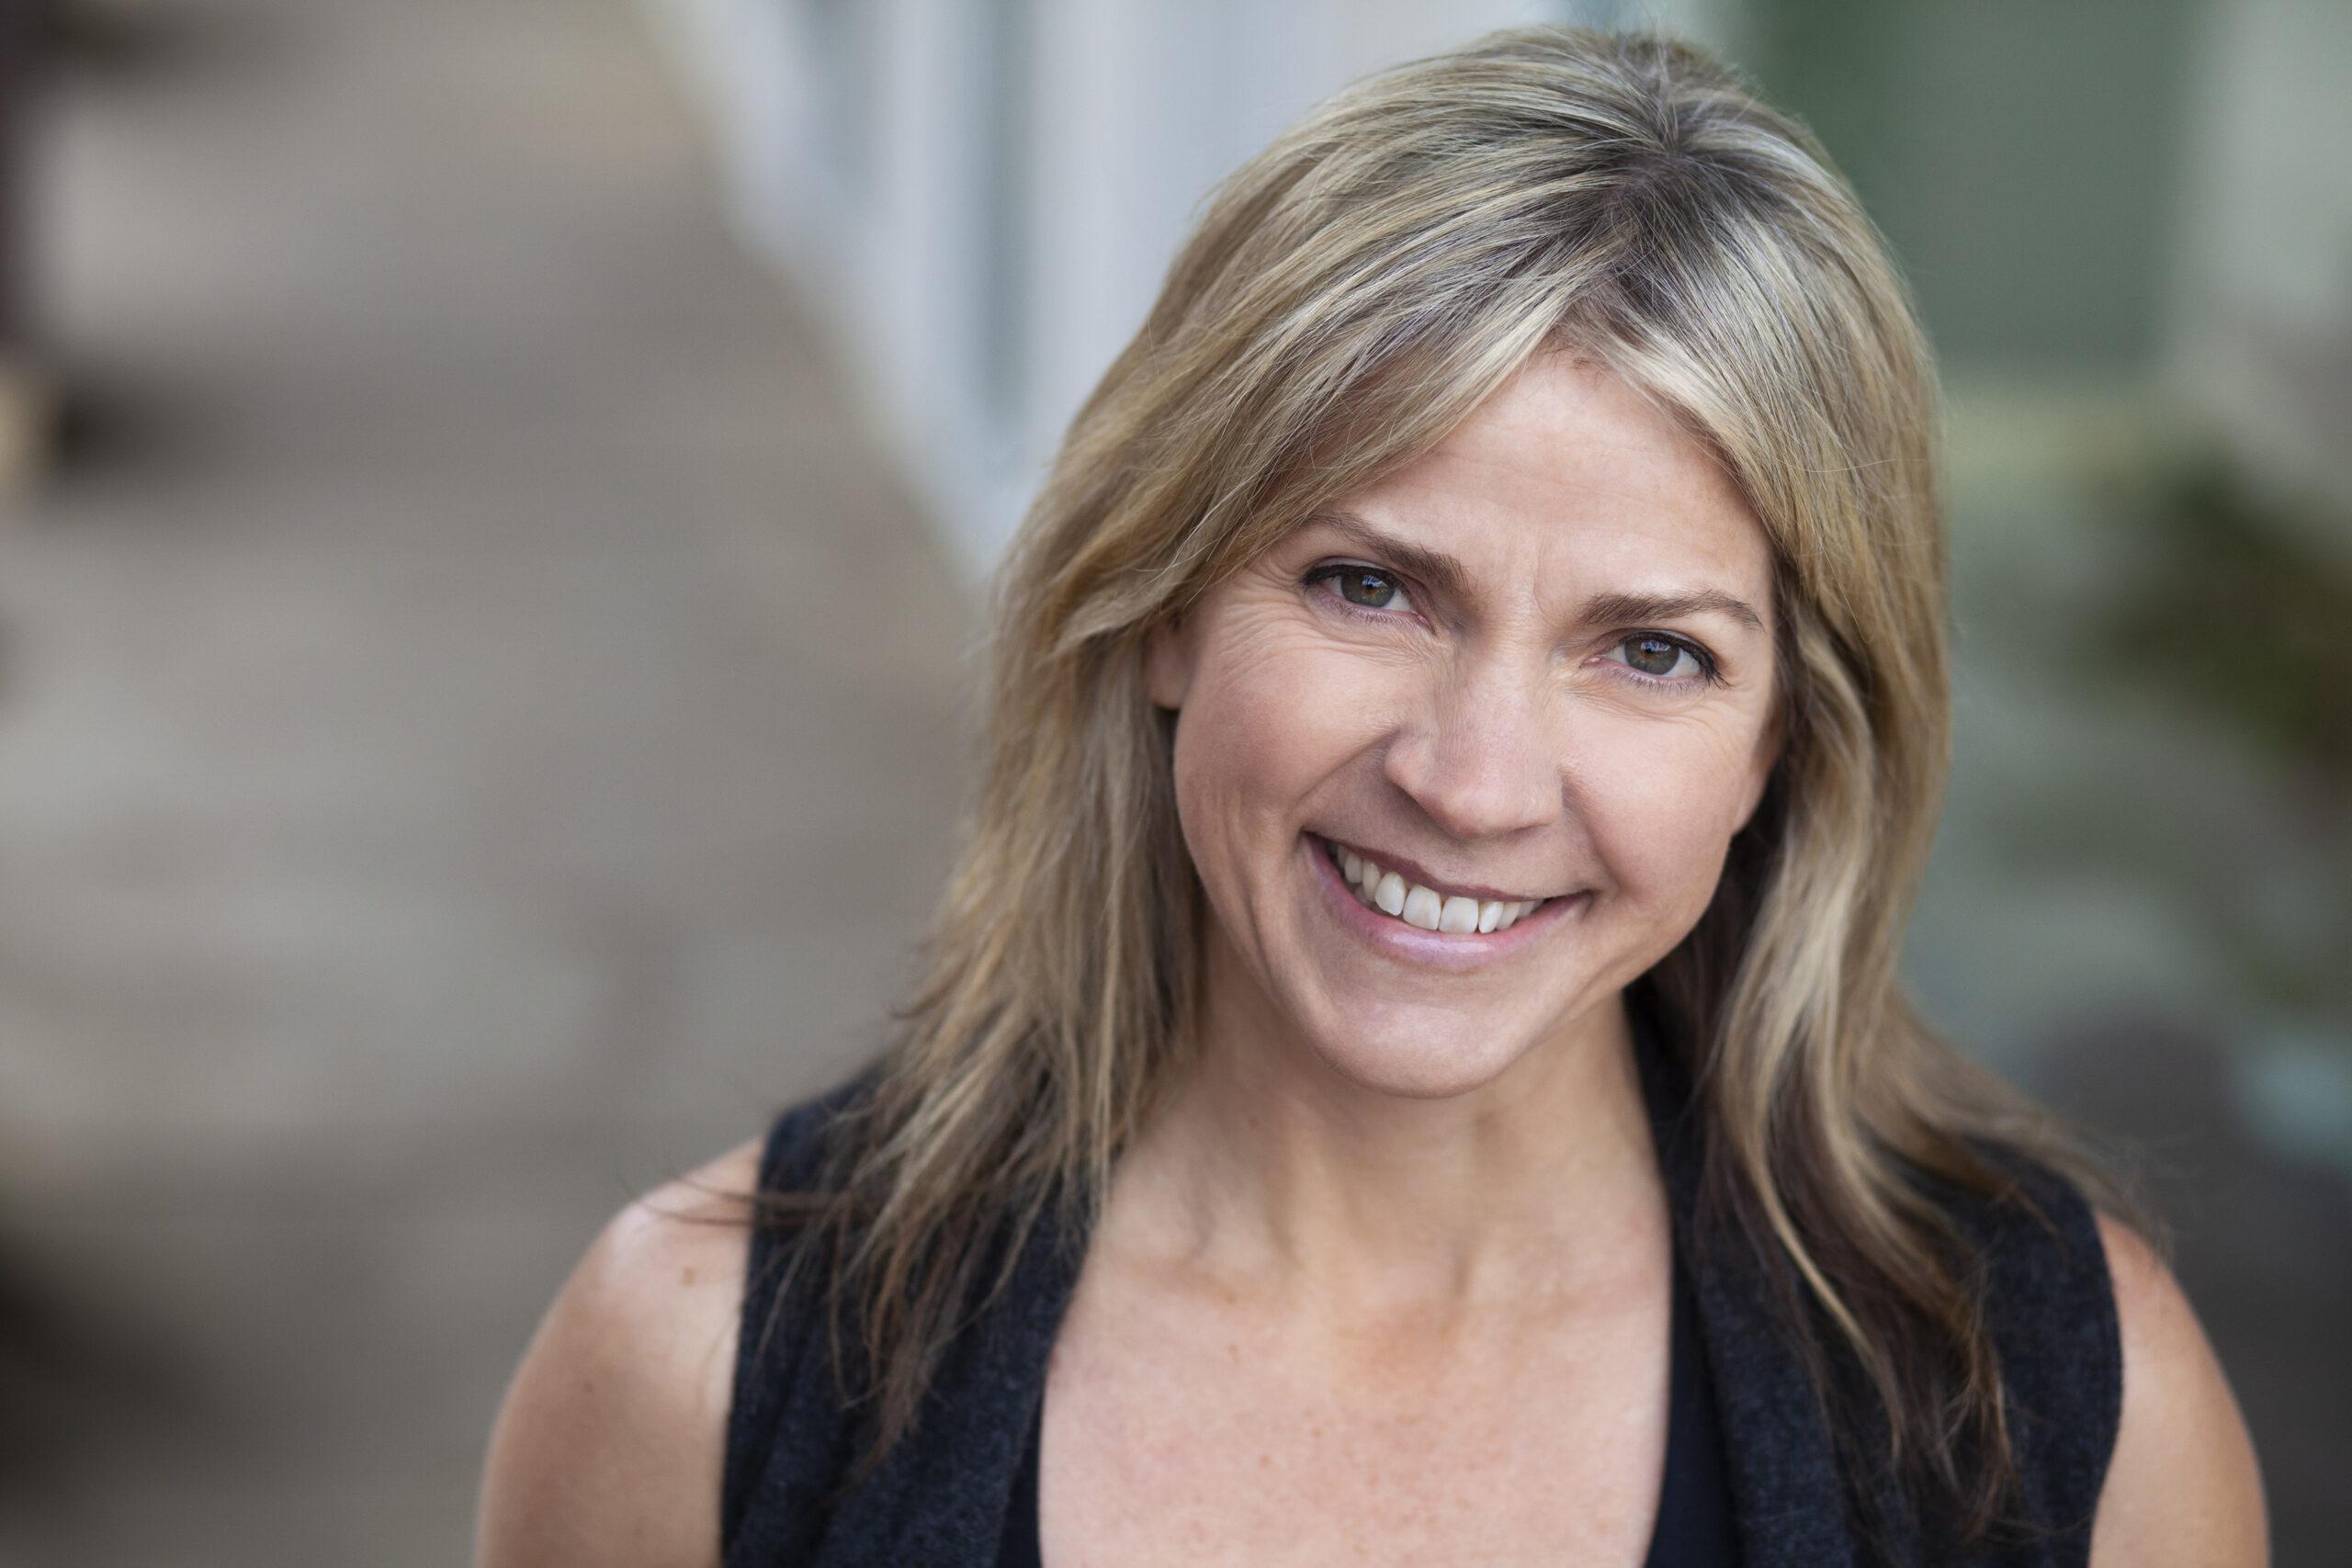 Frances Dell Bendert Stars in 'Troublemaker'